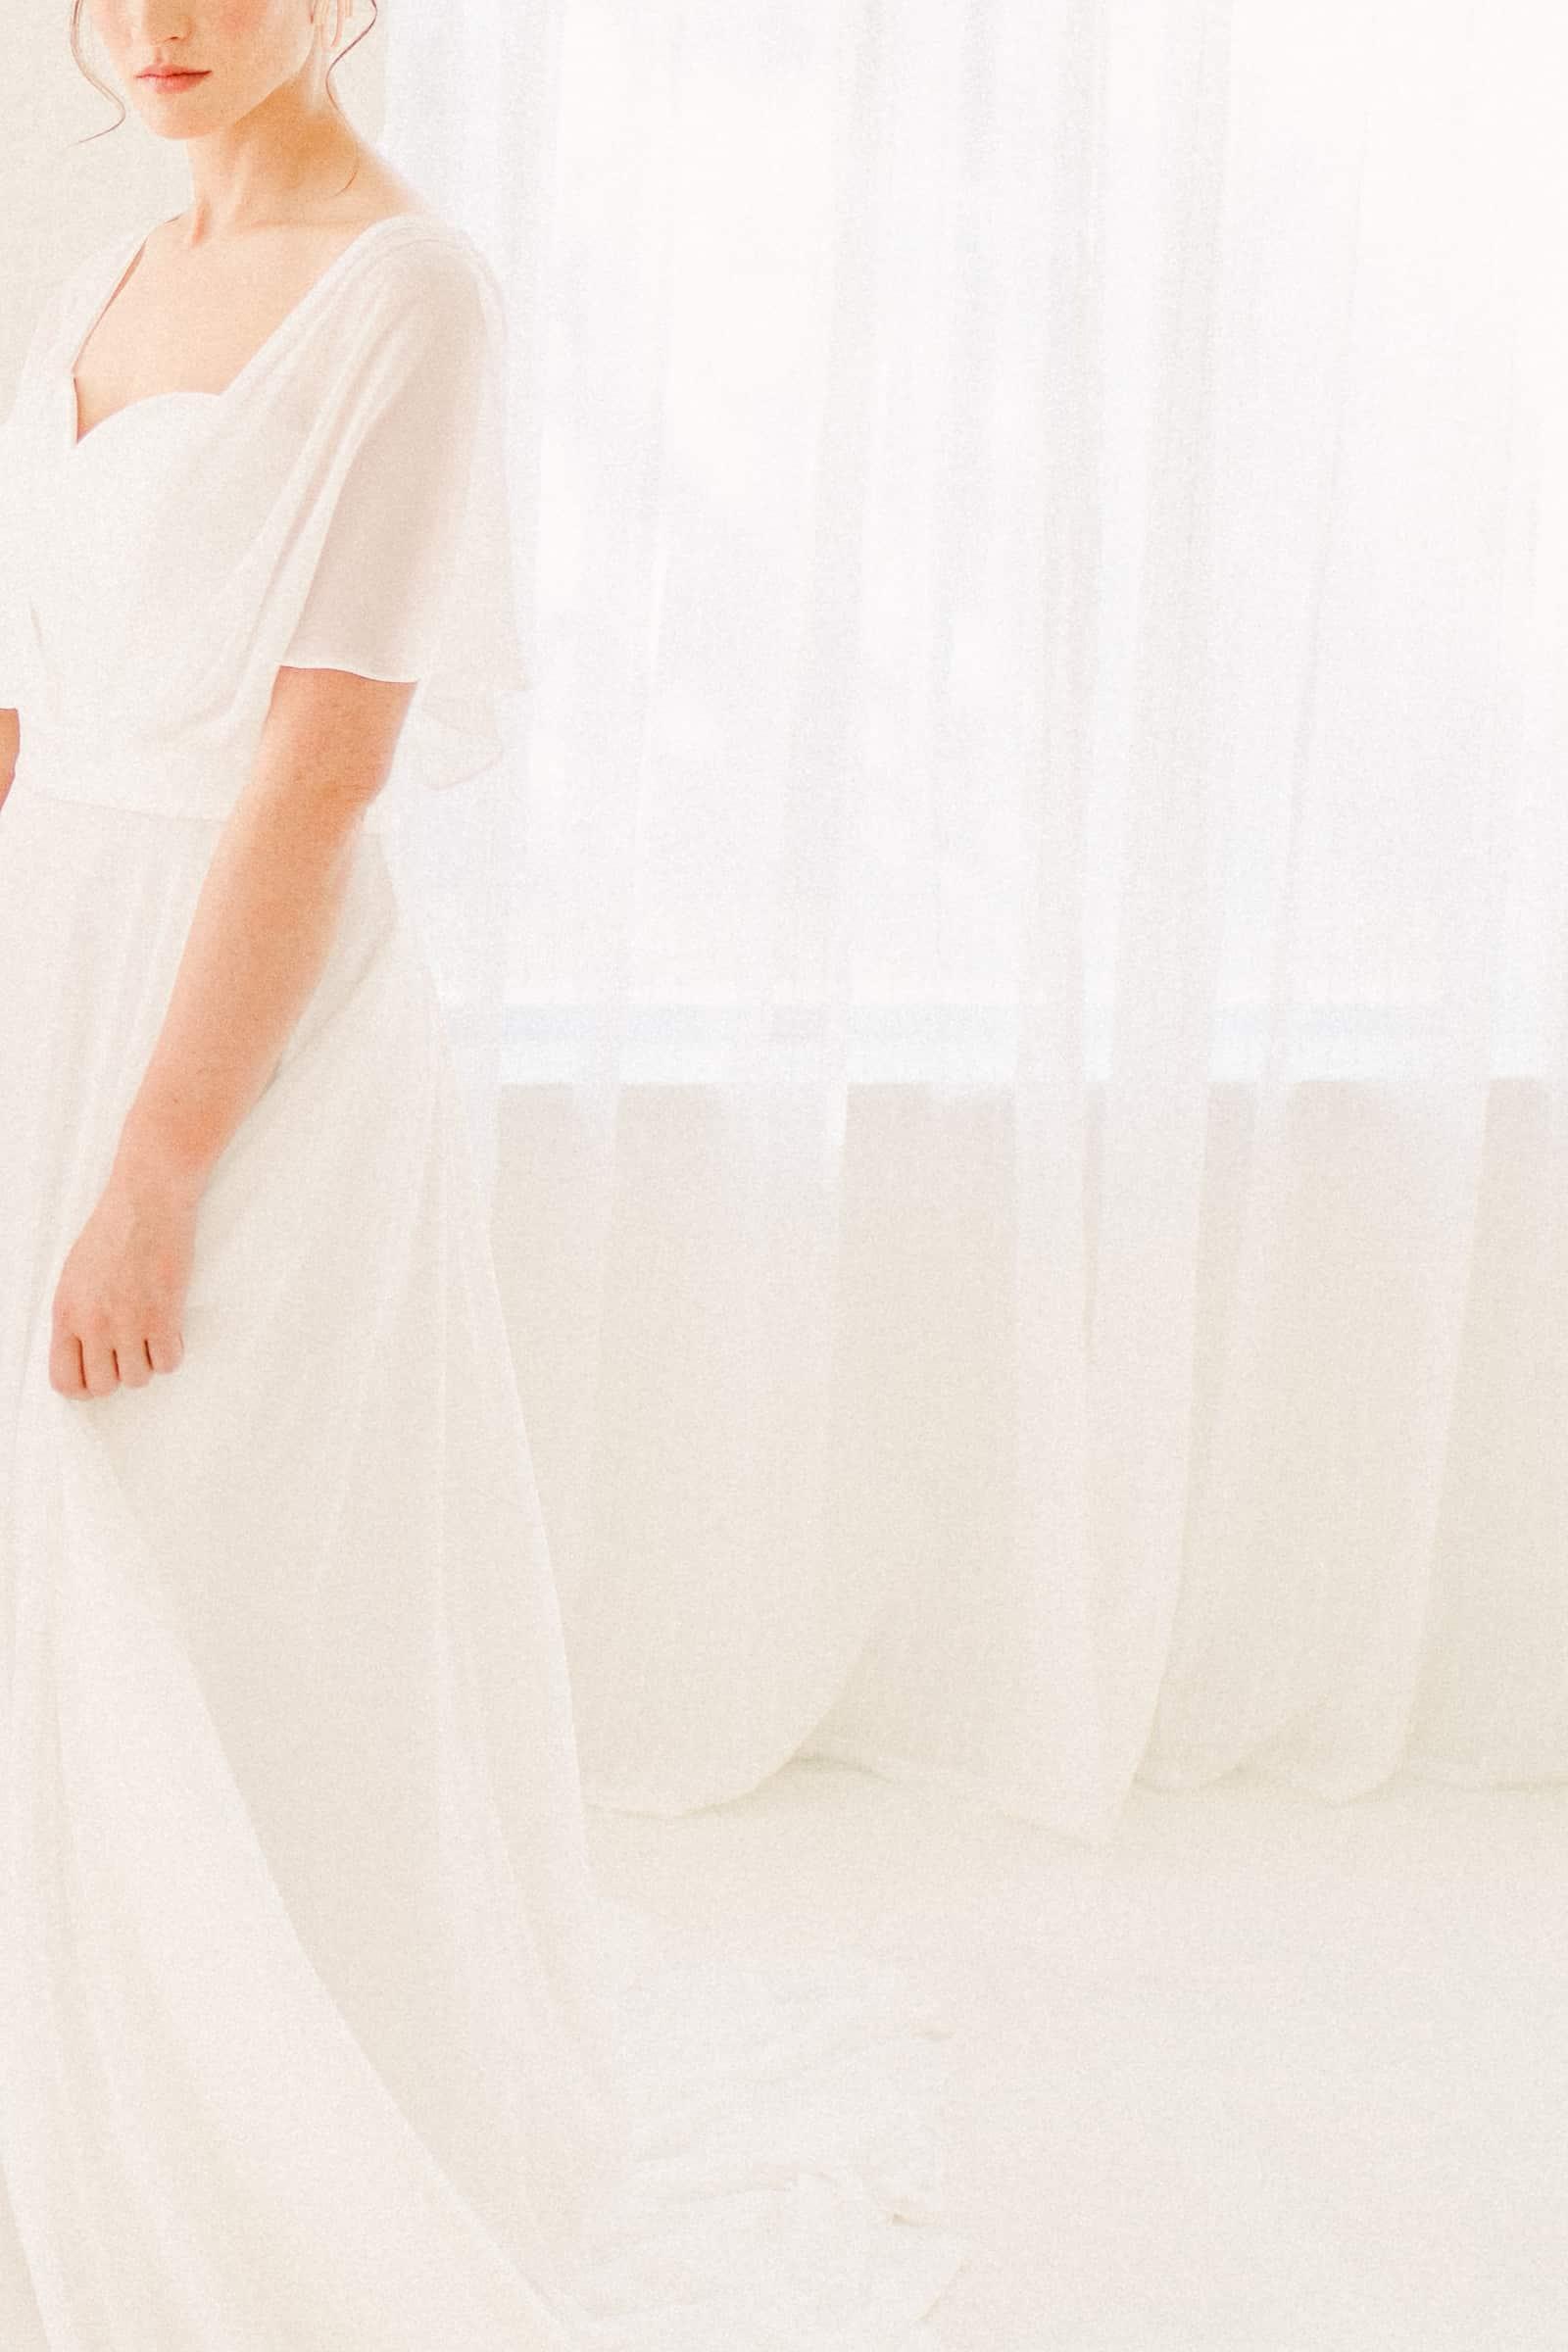 Simple modern chiffon flowy wedding dress with sweetheart neckline